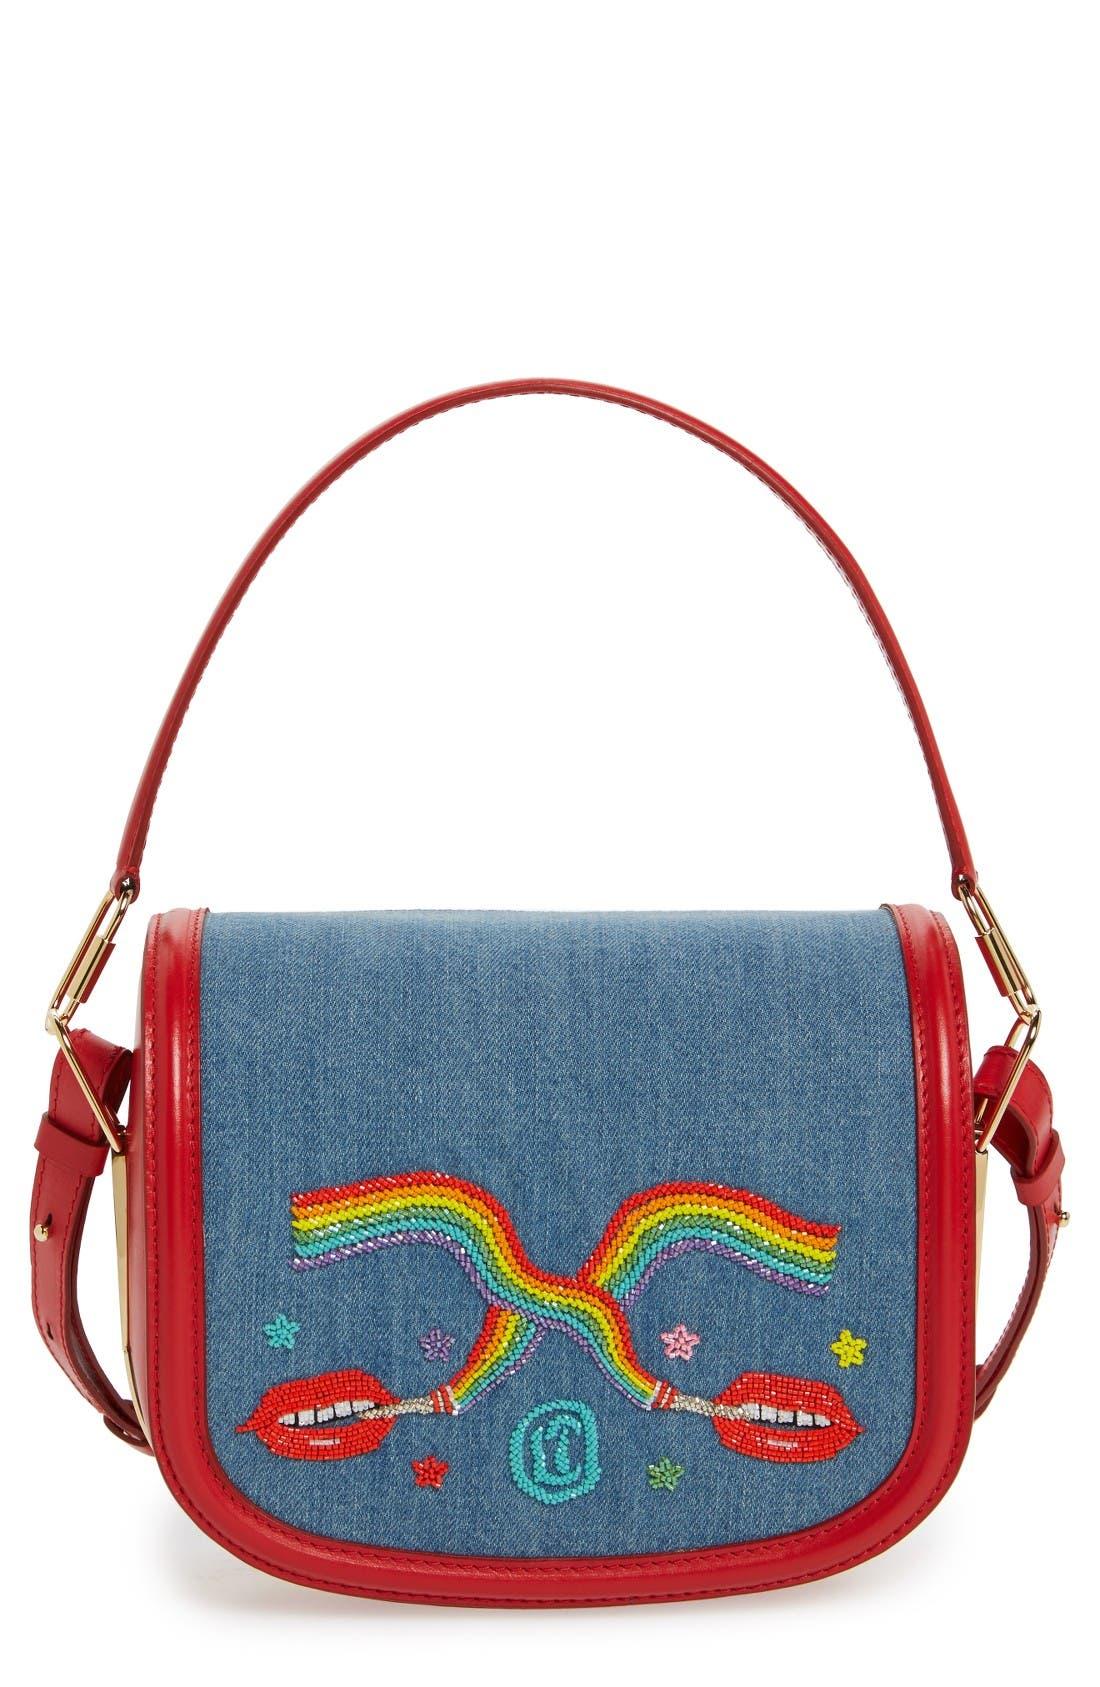 Dutchies Crossbody Bag,                             Main thumbnail 1, color,                             Blue